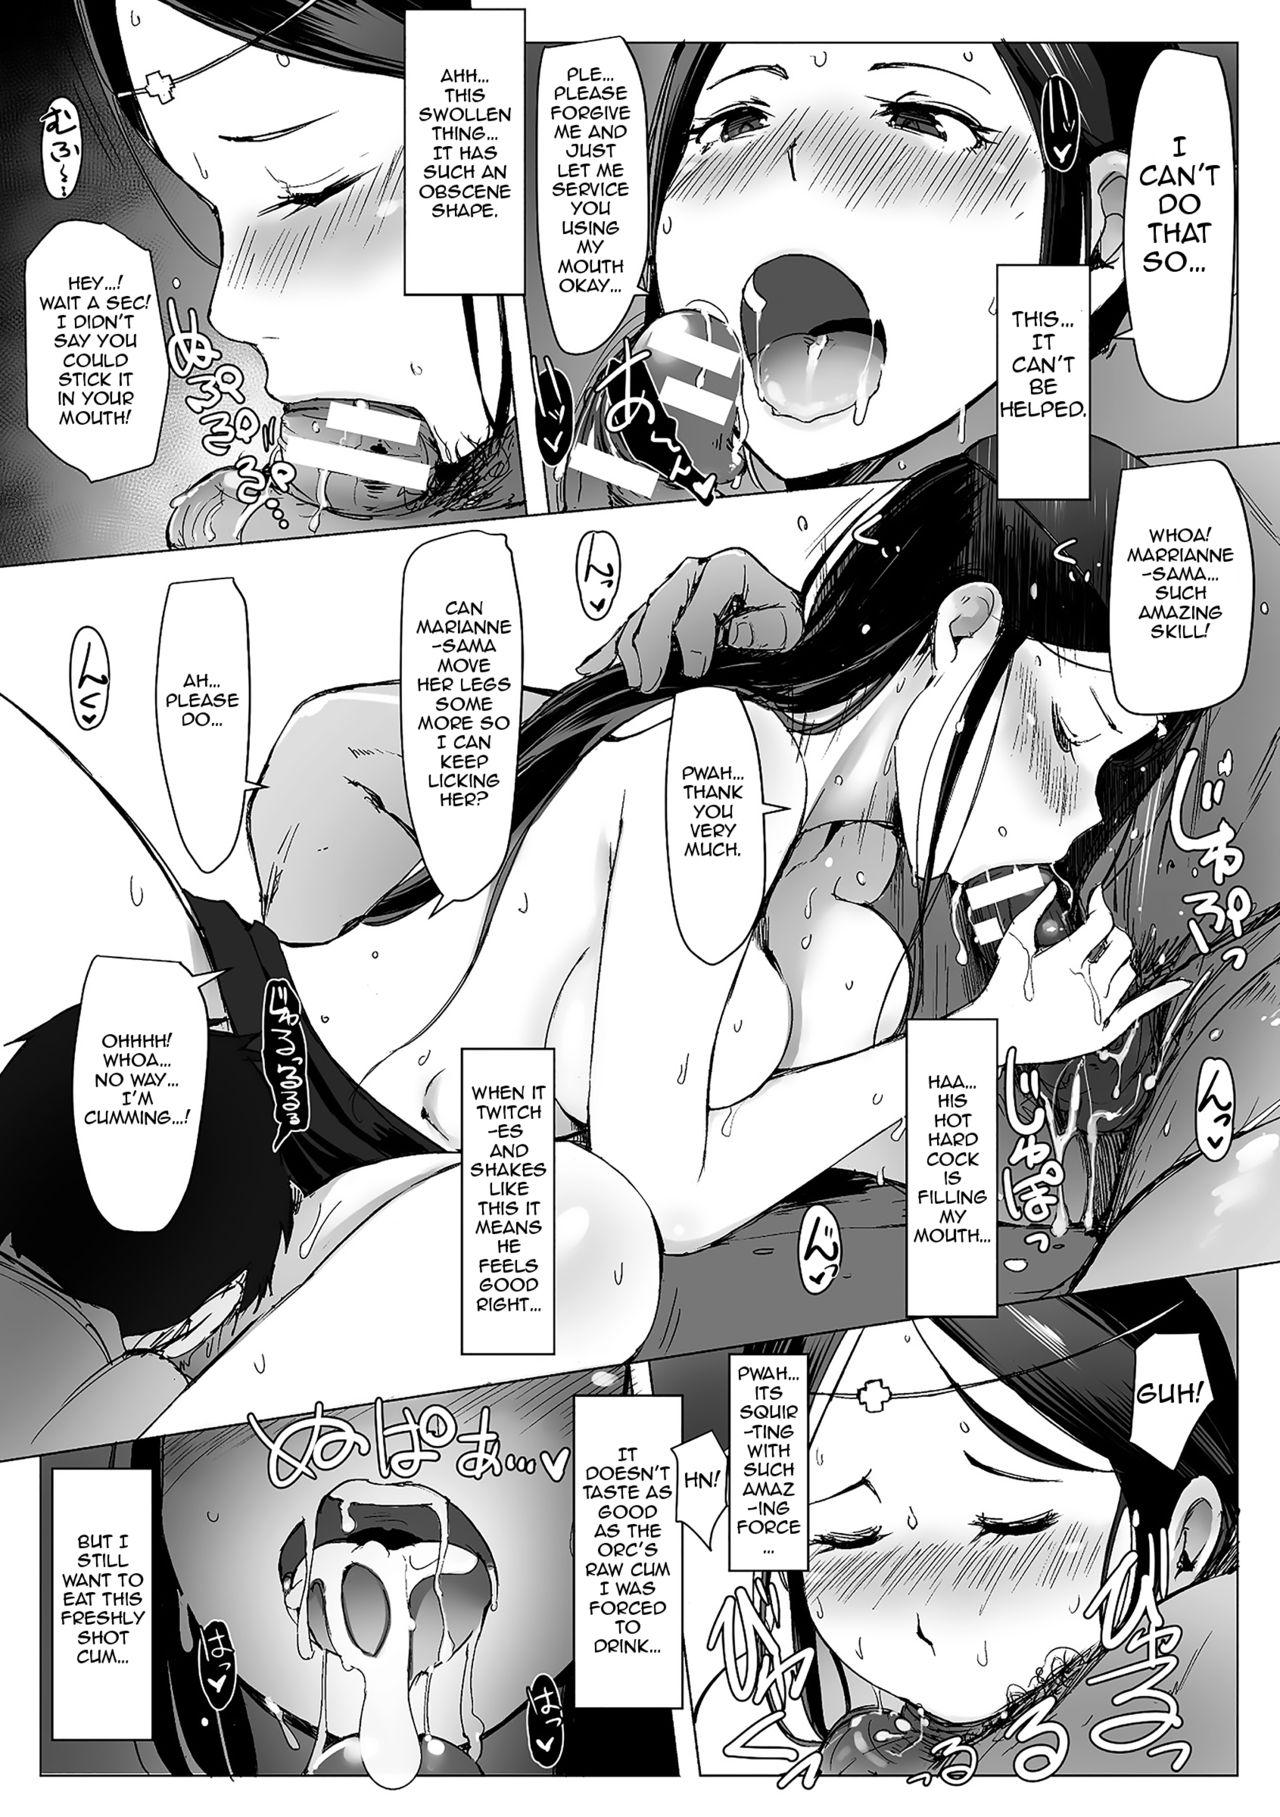 Yamaneko Kishidan Monogatari Onna Kishi Irina Dainiwa | The Tale of the Wildcat Chivalric Order's Knight Irina, Second Story 18